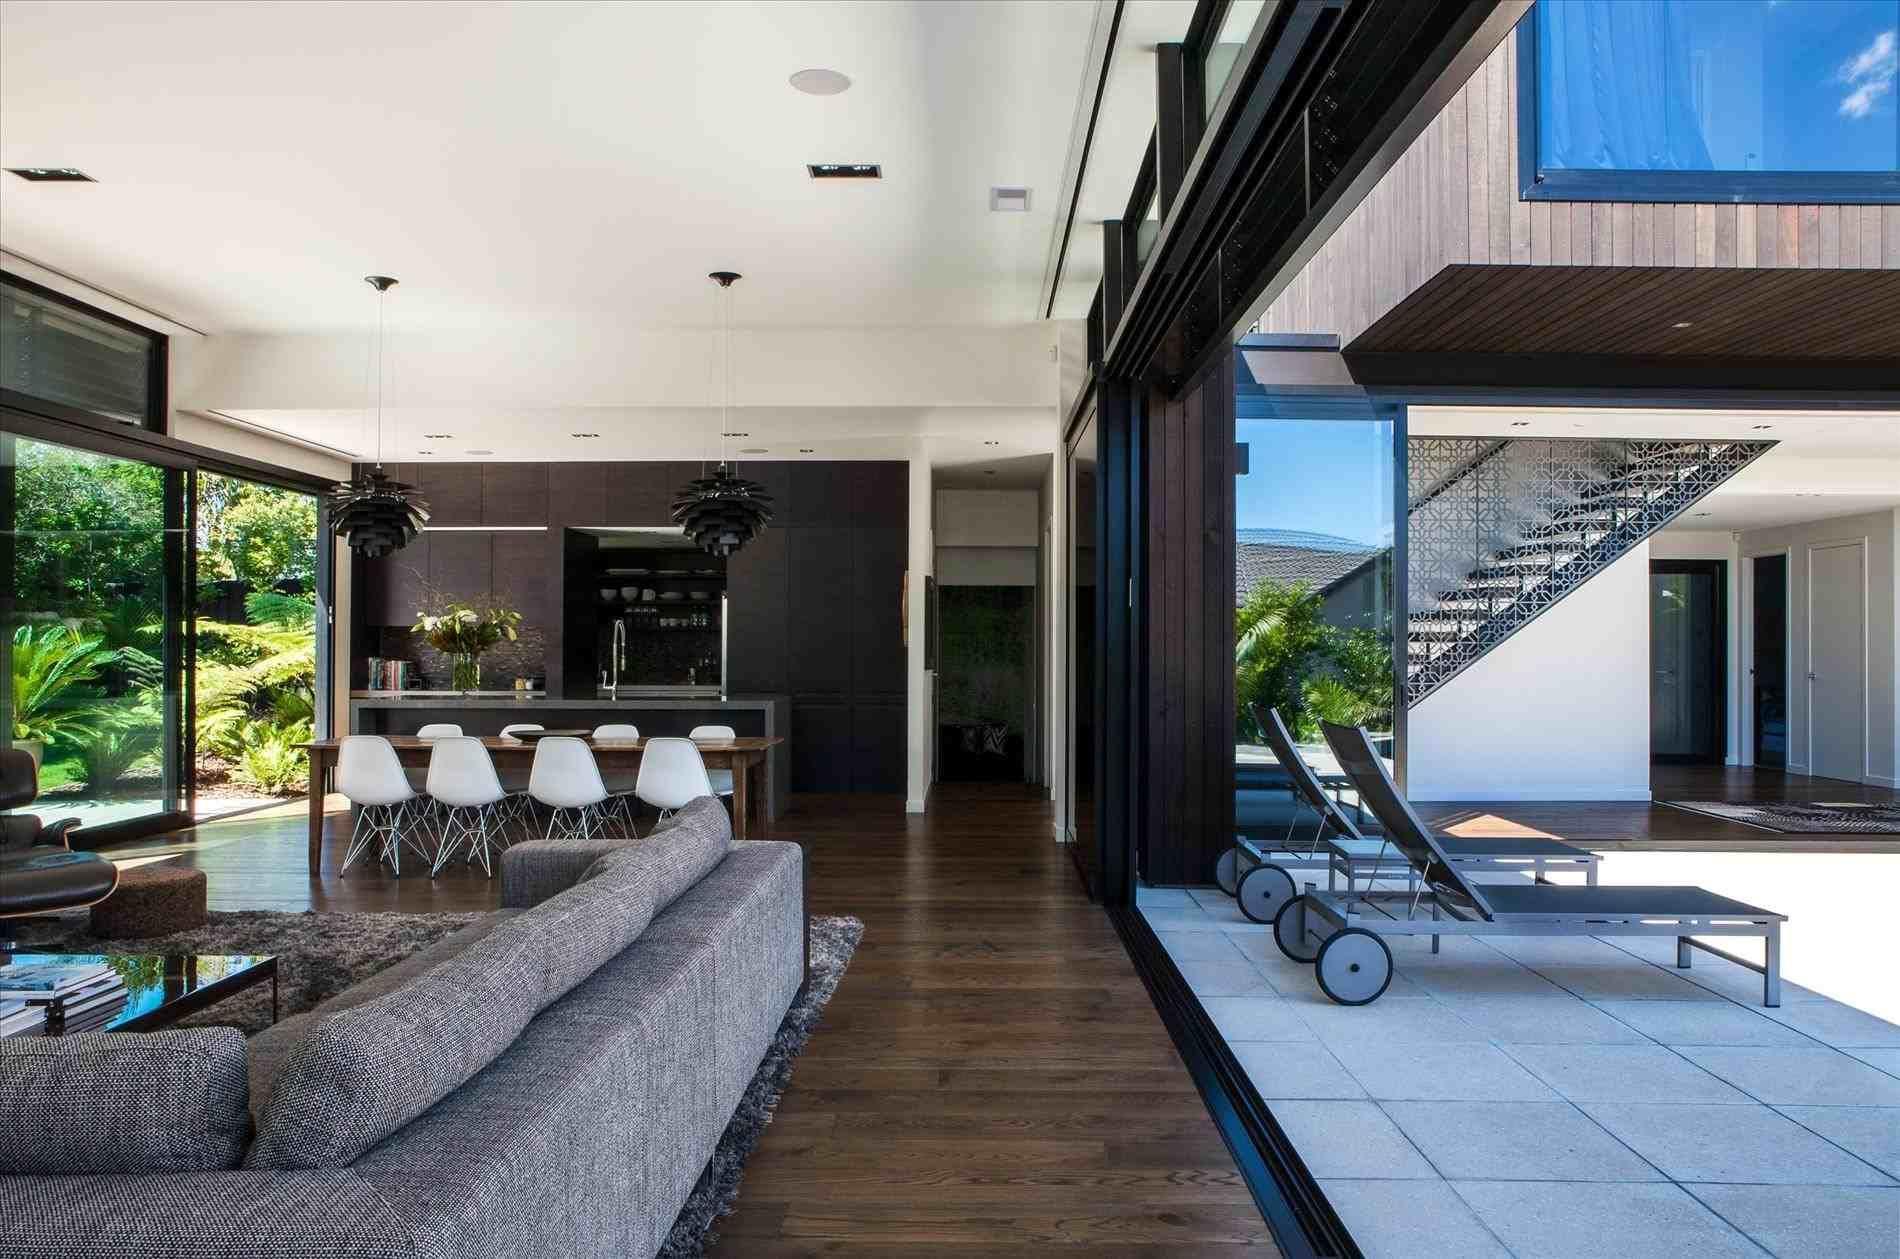 new post small ranch interior design visit bobayule trending decors - Small Ranch Interior Design